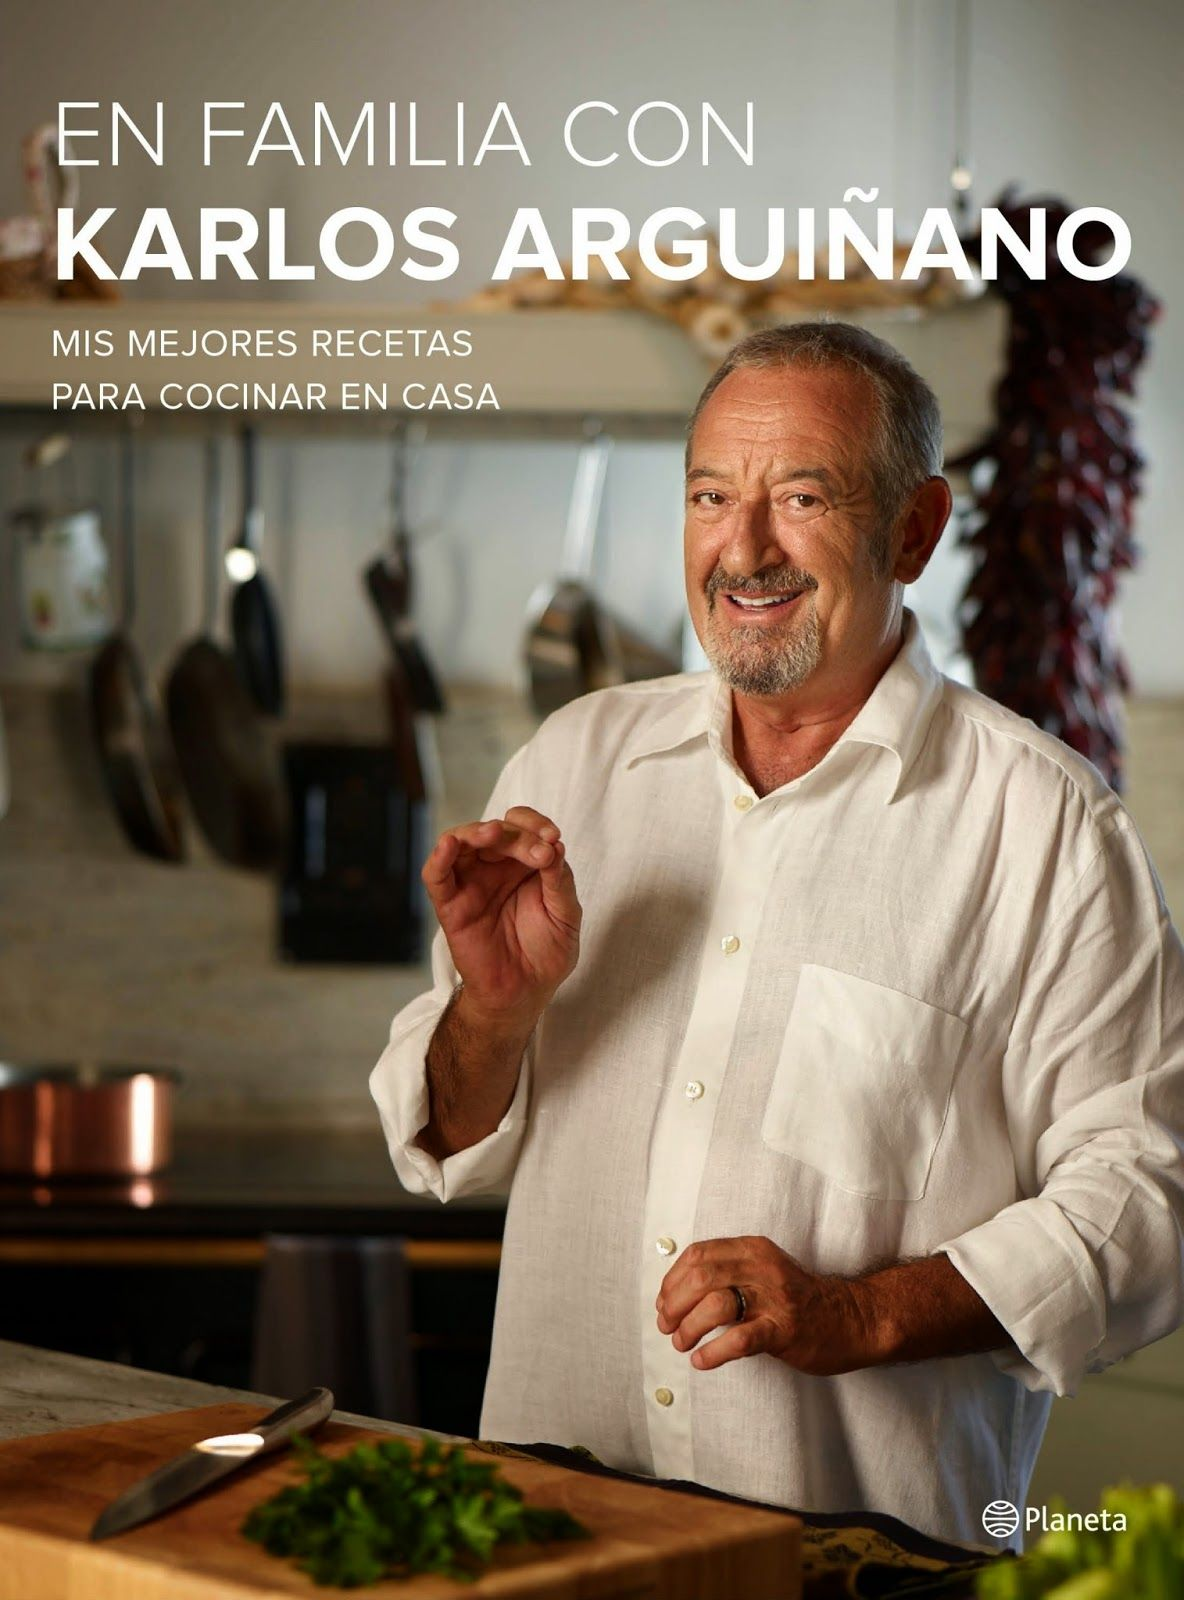 TUMATEIX  LLIBRES, parlem de llibres.: EN FAMILIA CON KARLOS ARGUIÑANO